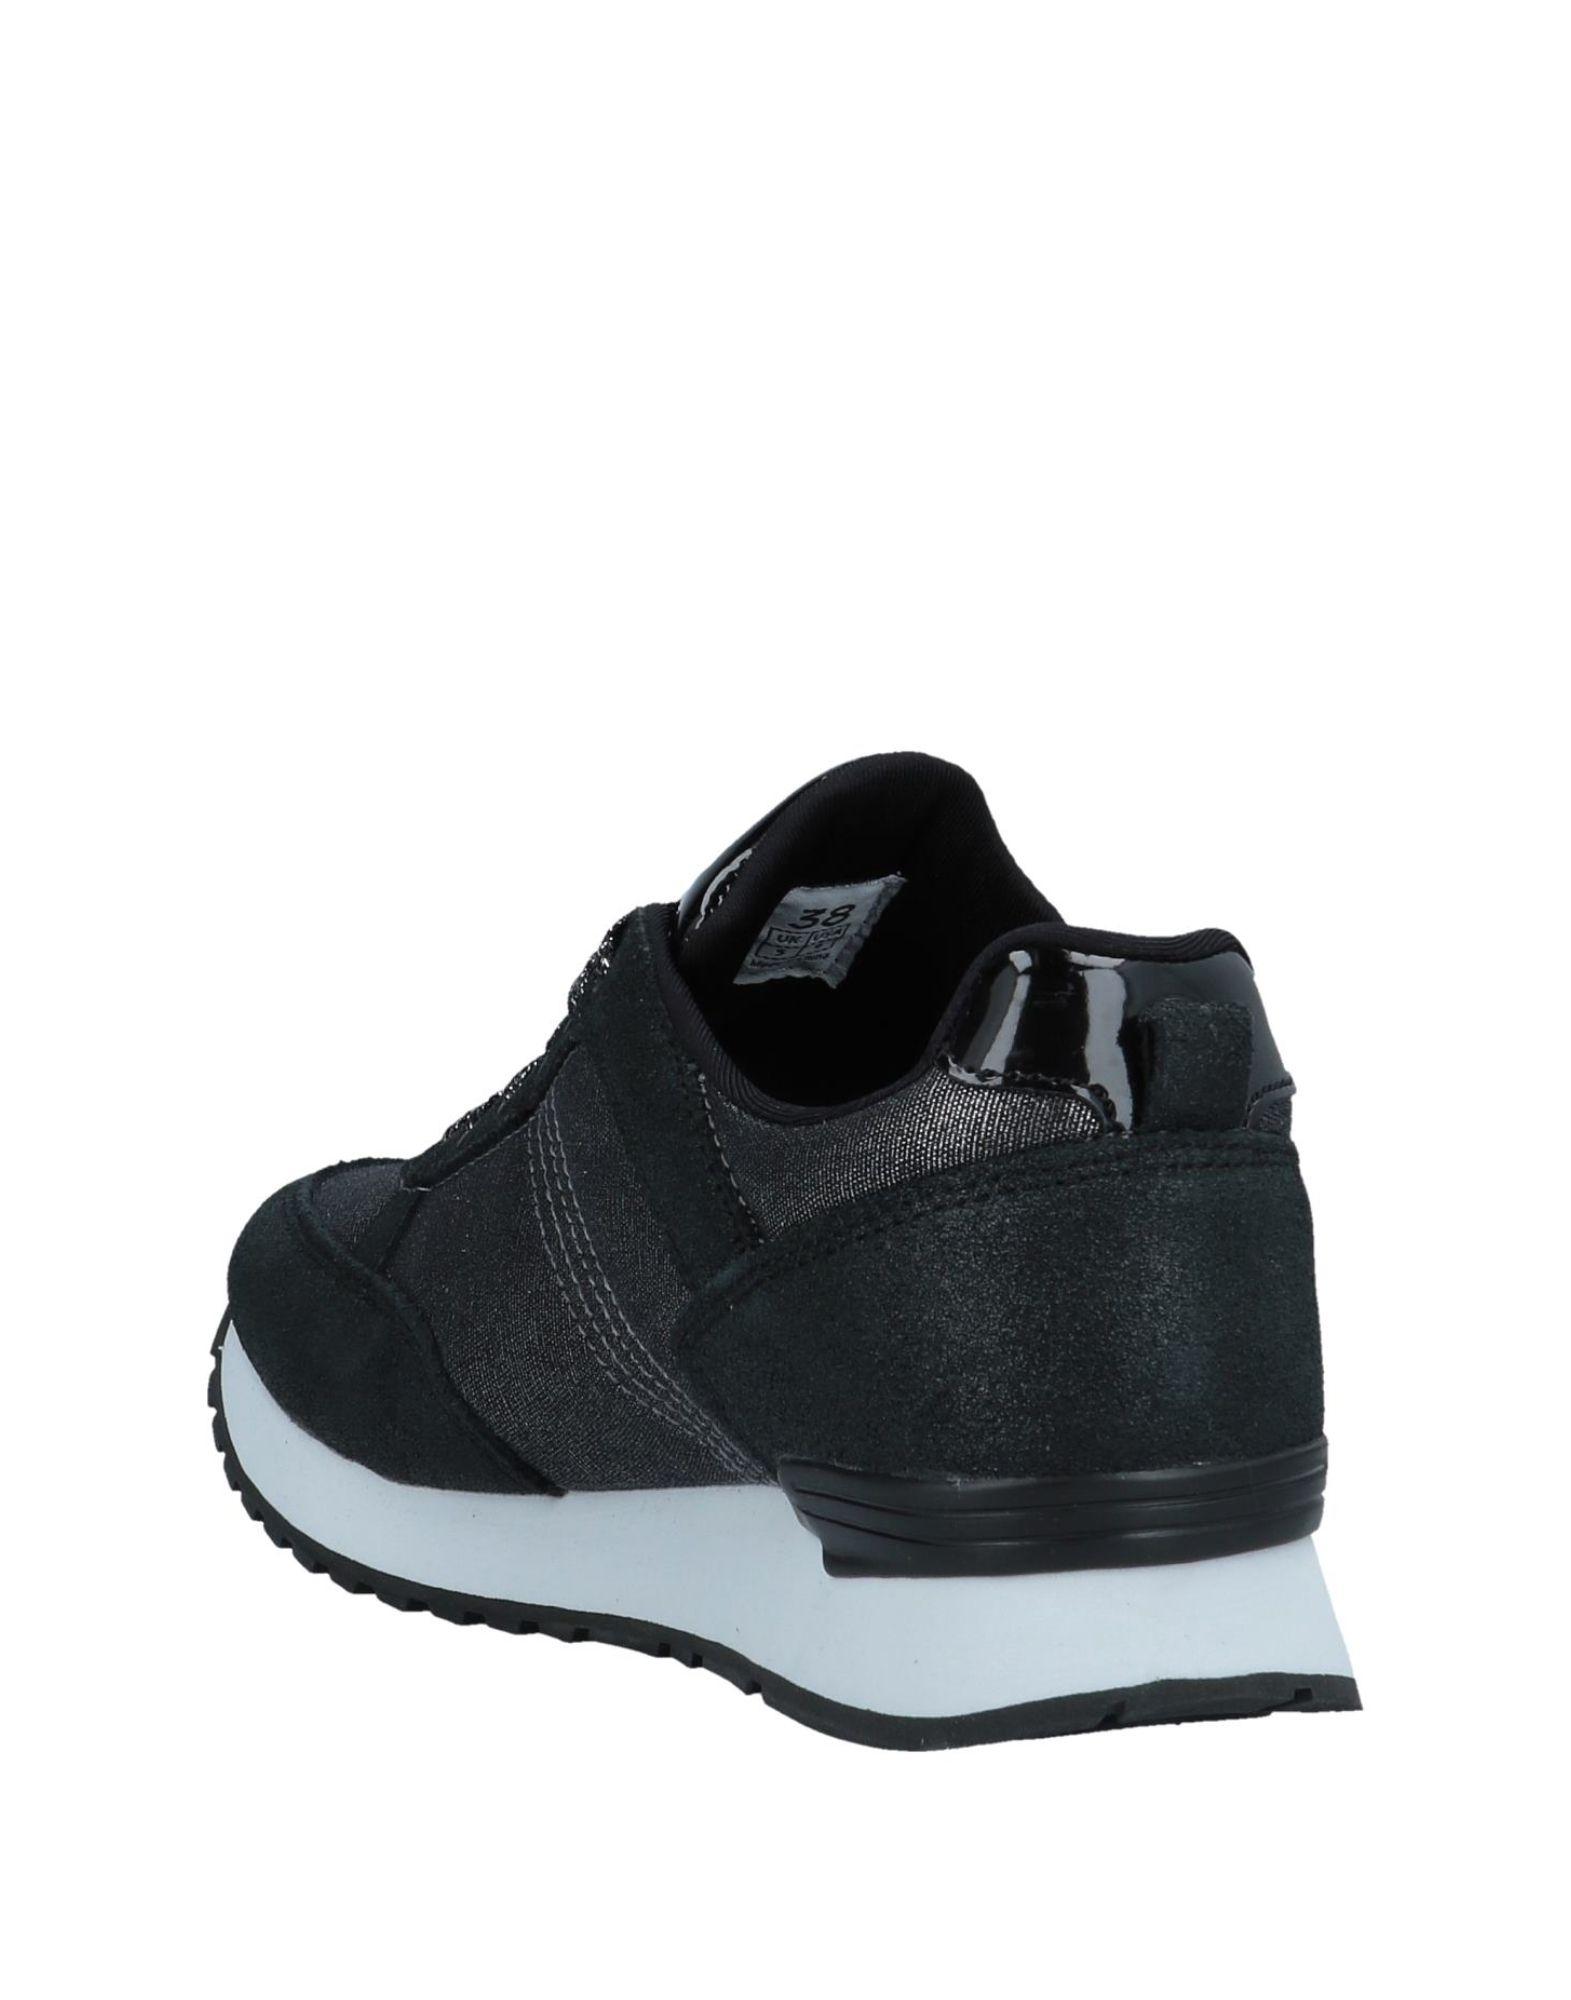 Colmar Sneakers Damen  beliebte 11553294GQ Gute Qualität beliebte  Schuhe 300444